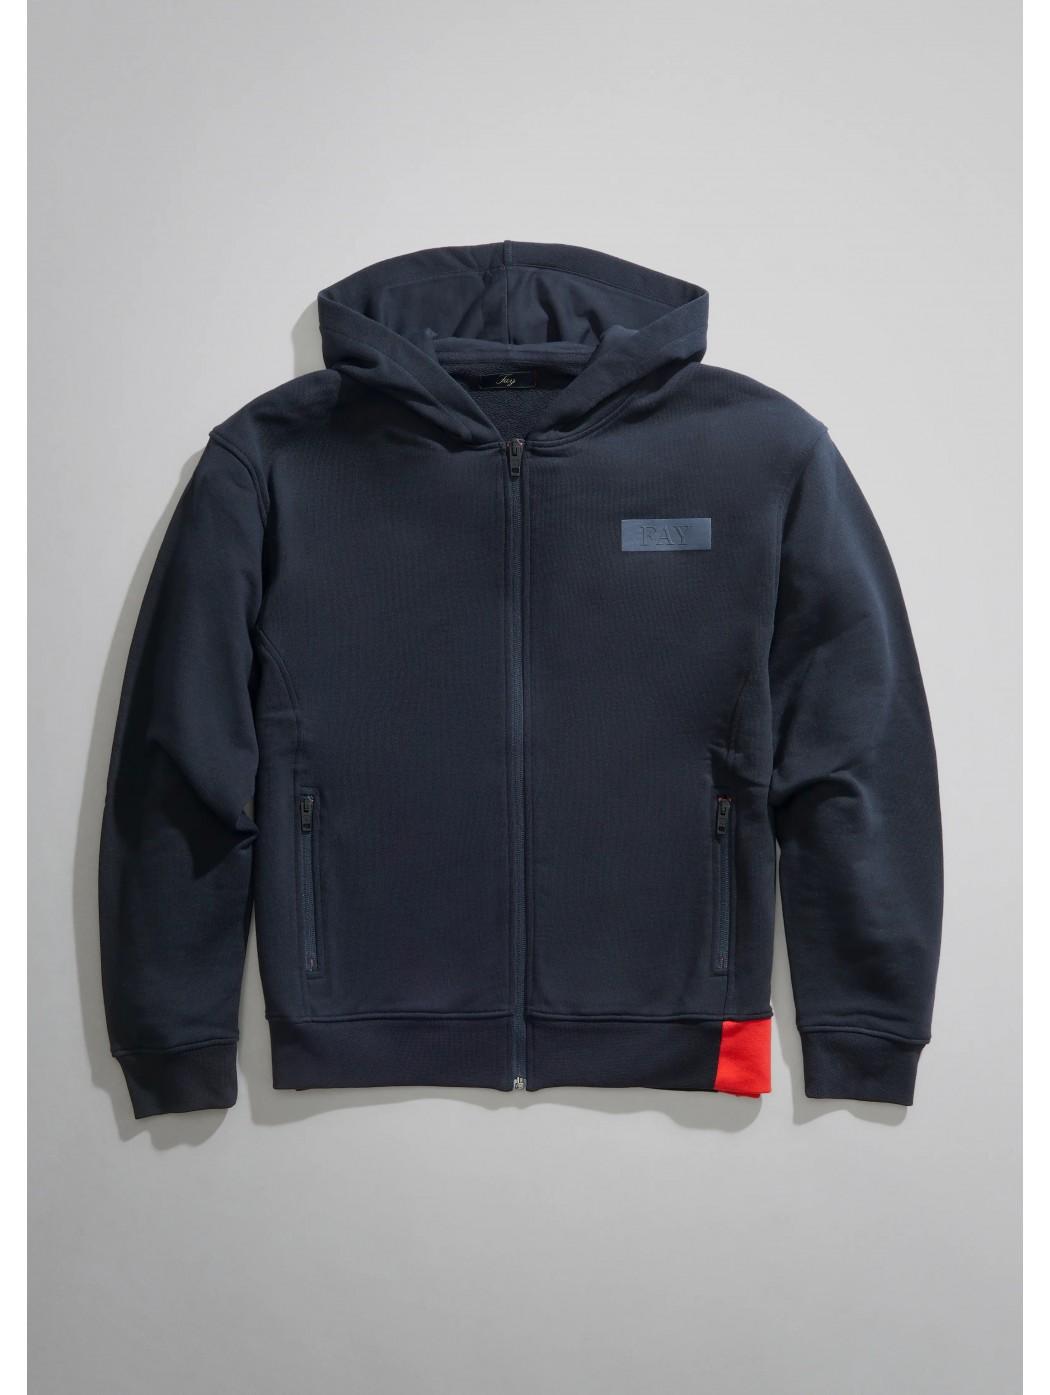 Zipped Sweatshirt FAY...